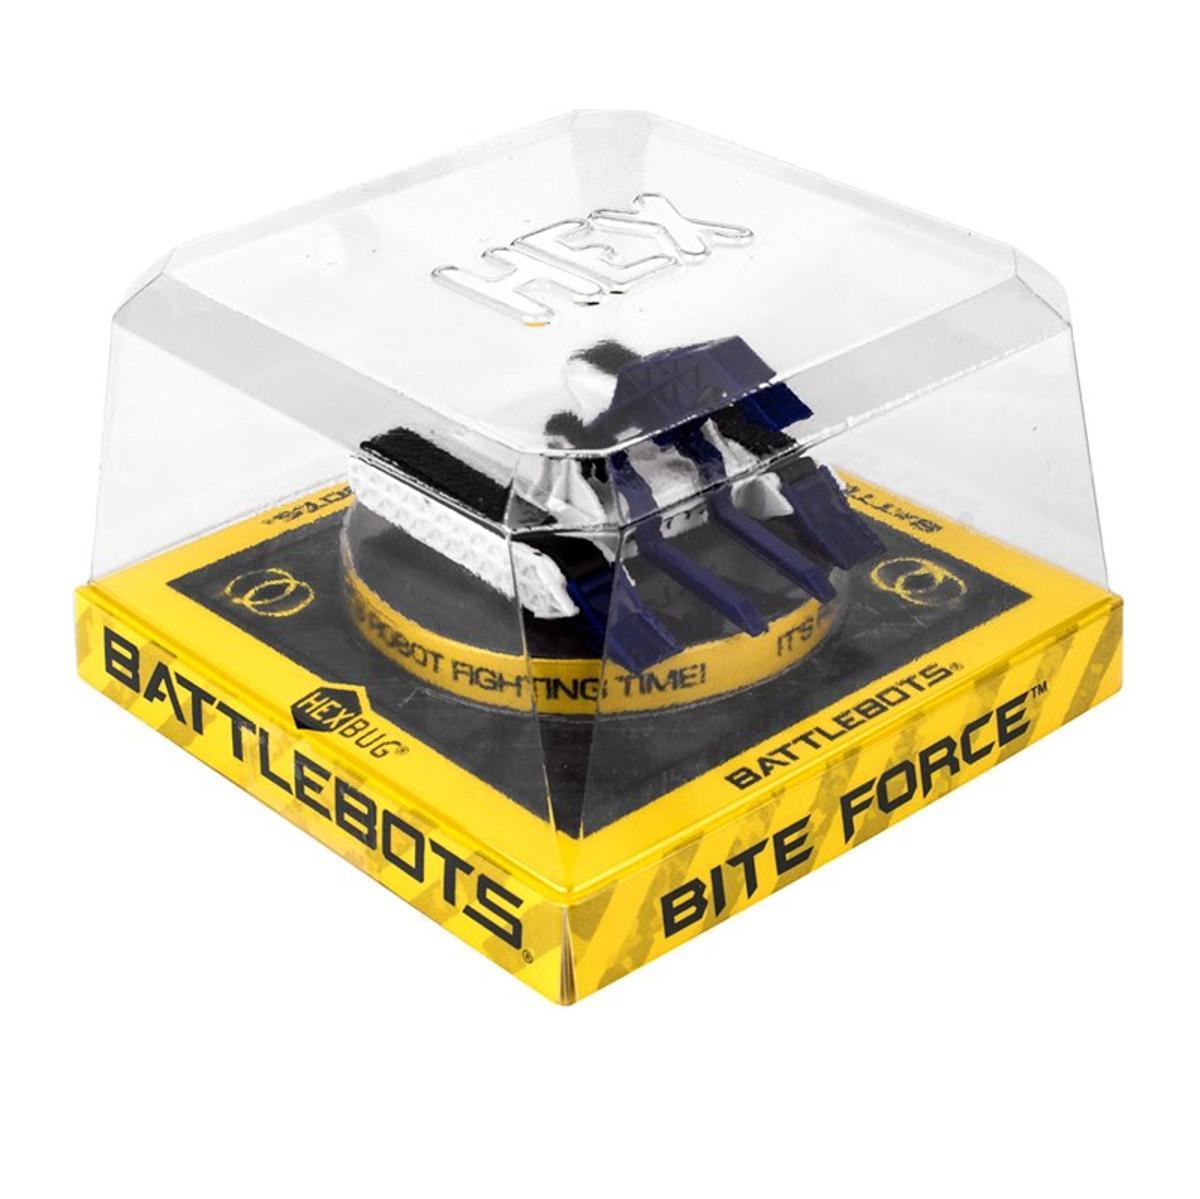 HexBug Battlebots Bite Force